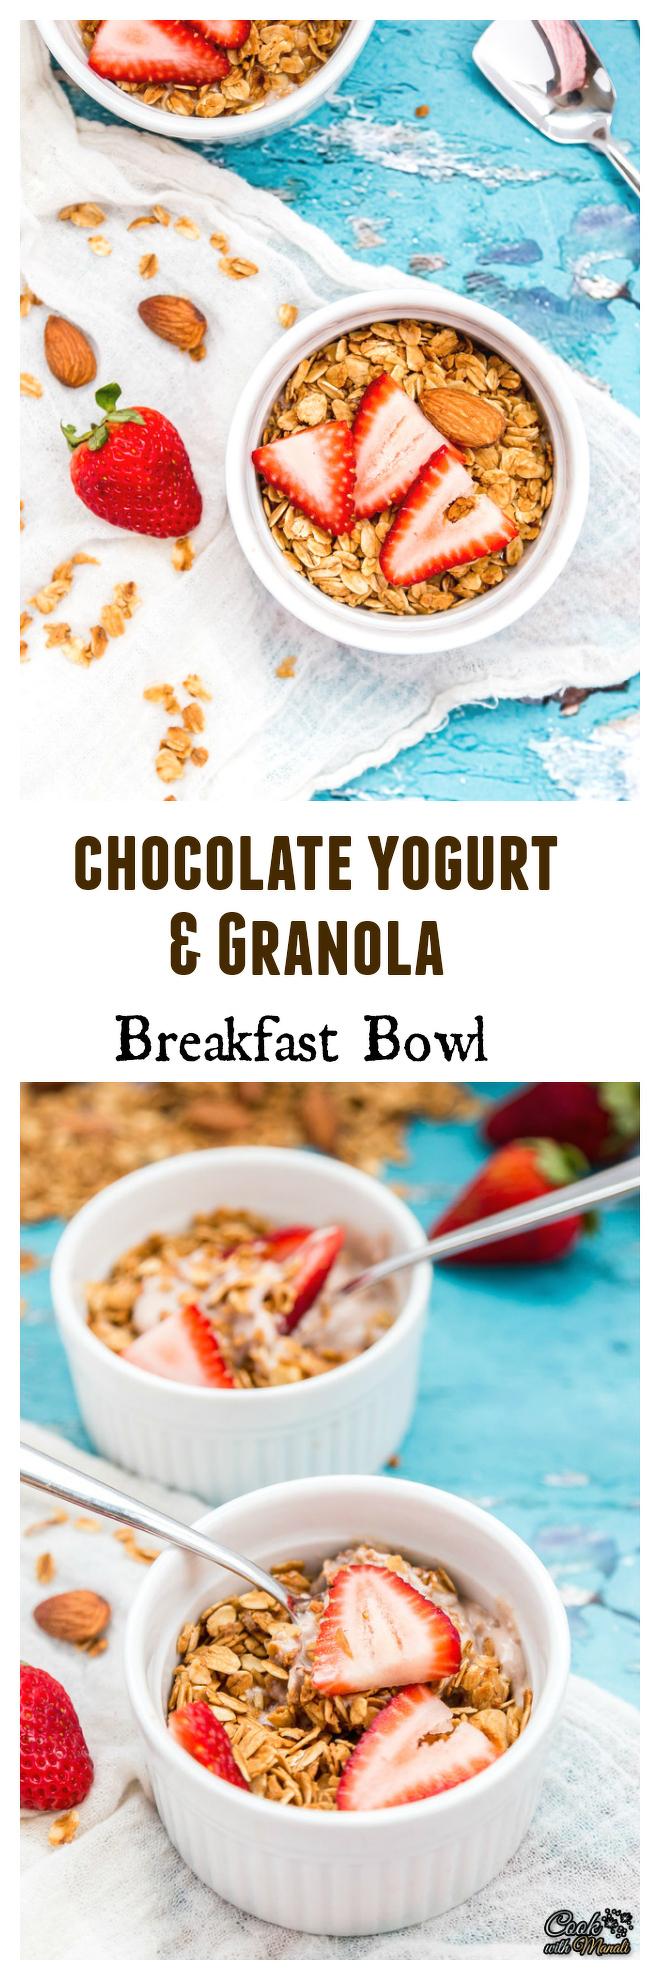 Chocolate Yogurt & Granola Breakfast Bowl Collage-nocwm